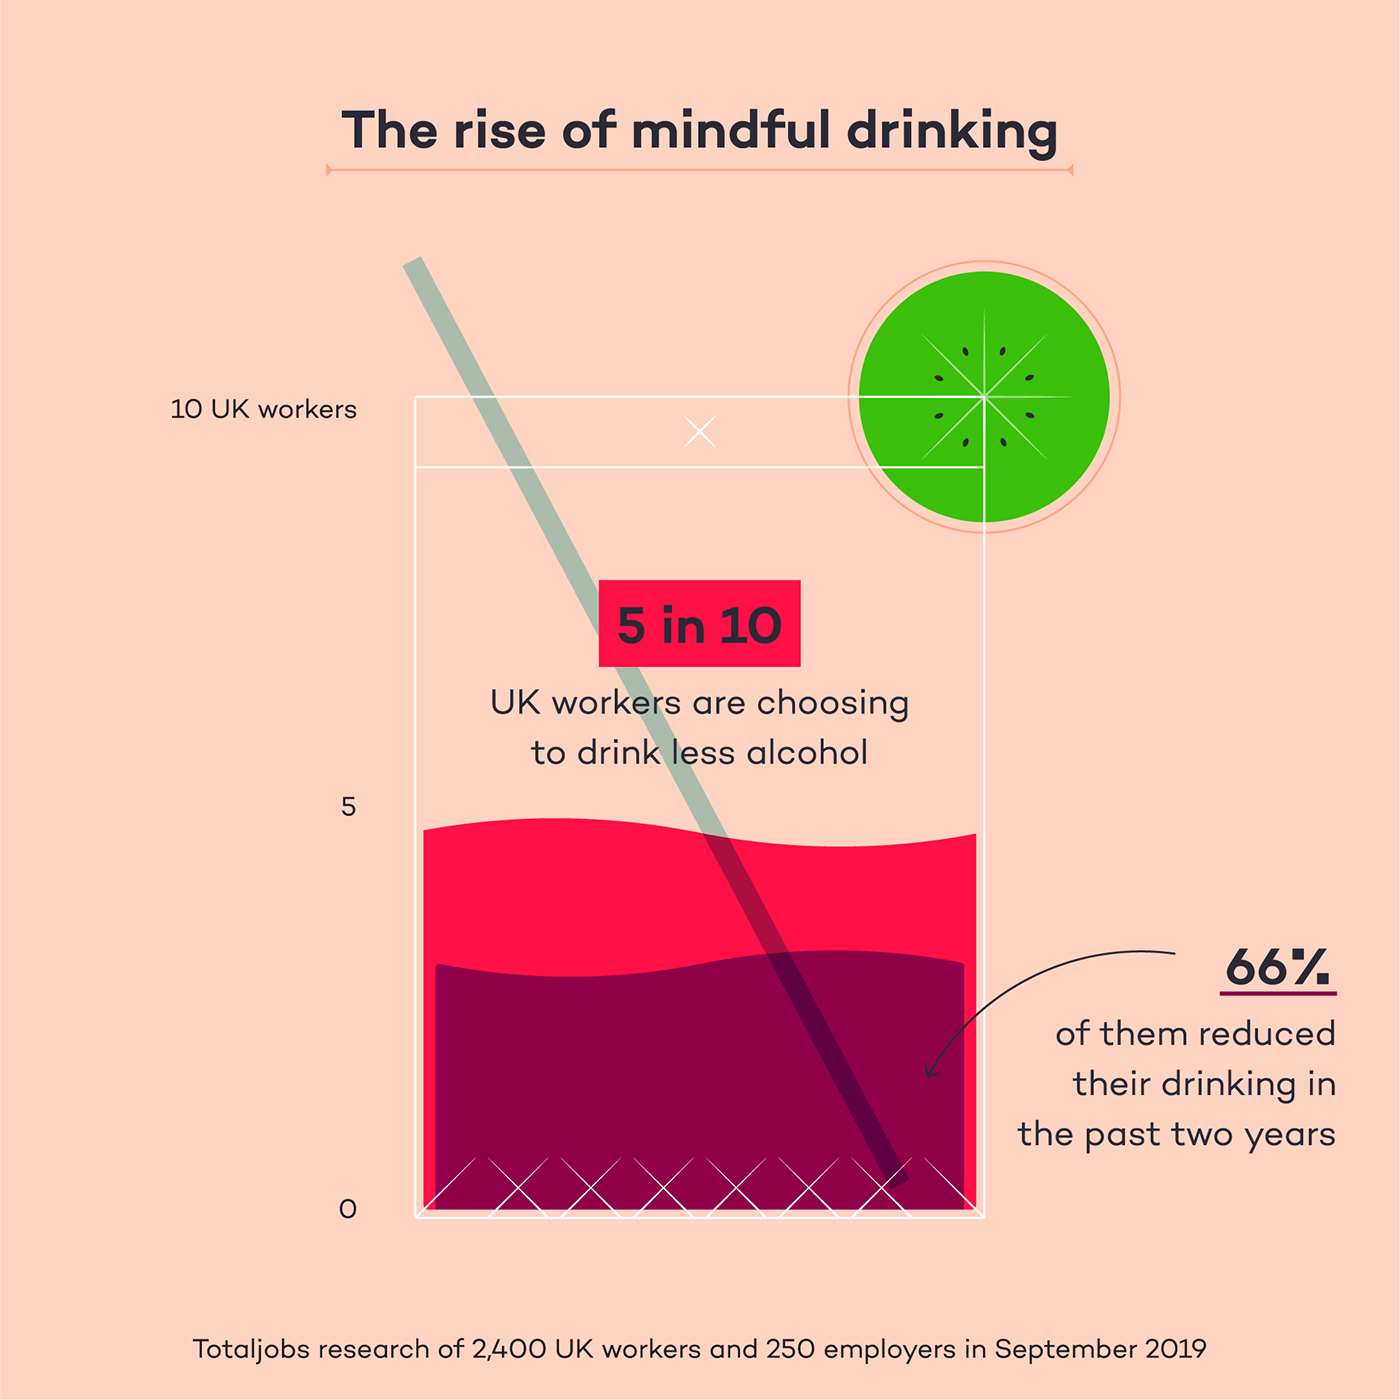 alcohol sober mindful drinking article Data Viz data visualization ILLUSTRATION  editorial generation x milennials